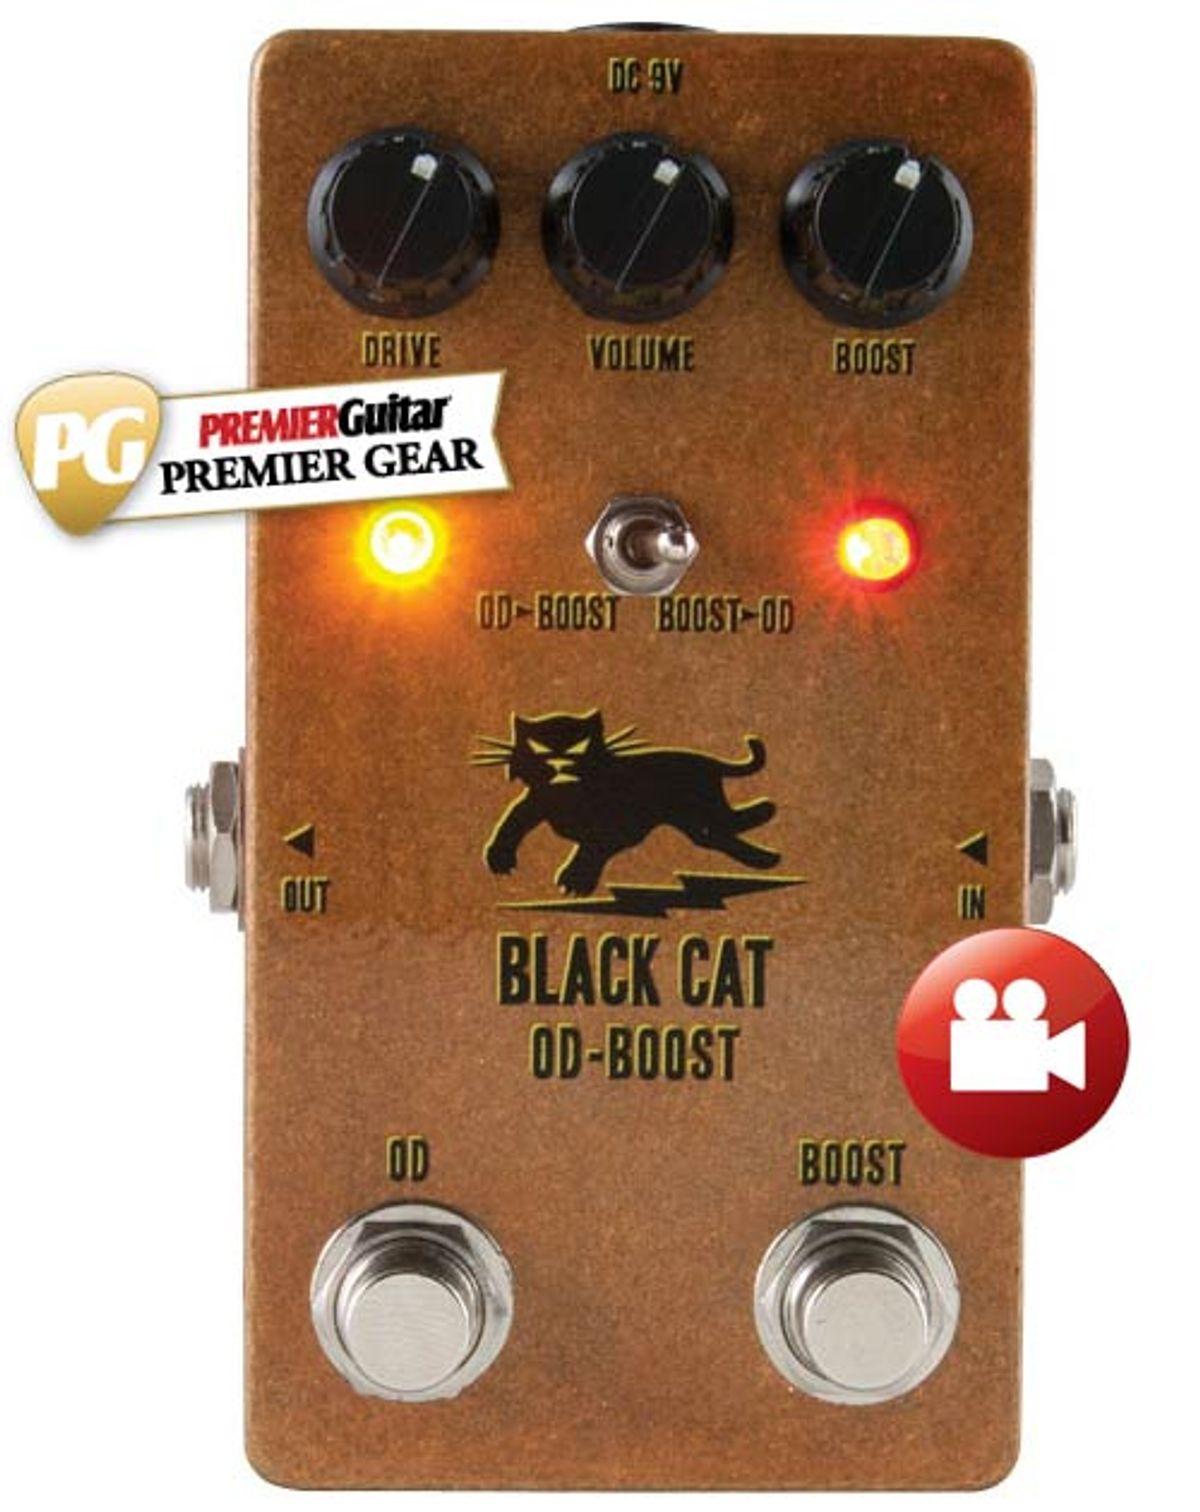 Black Cat OD-Boost Review